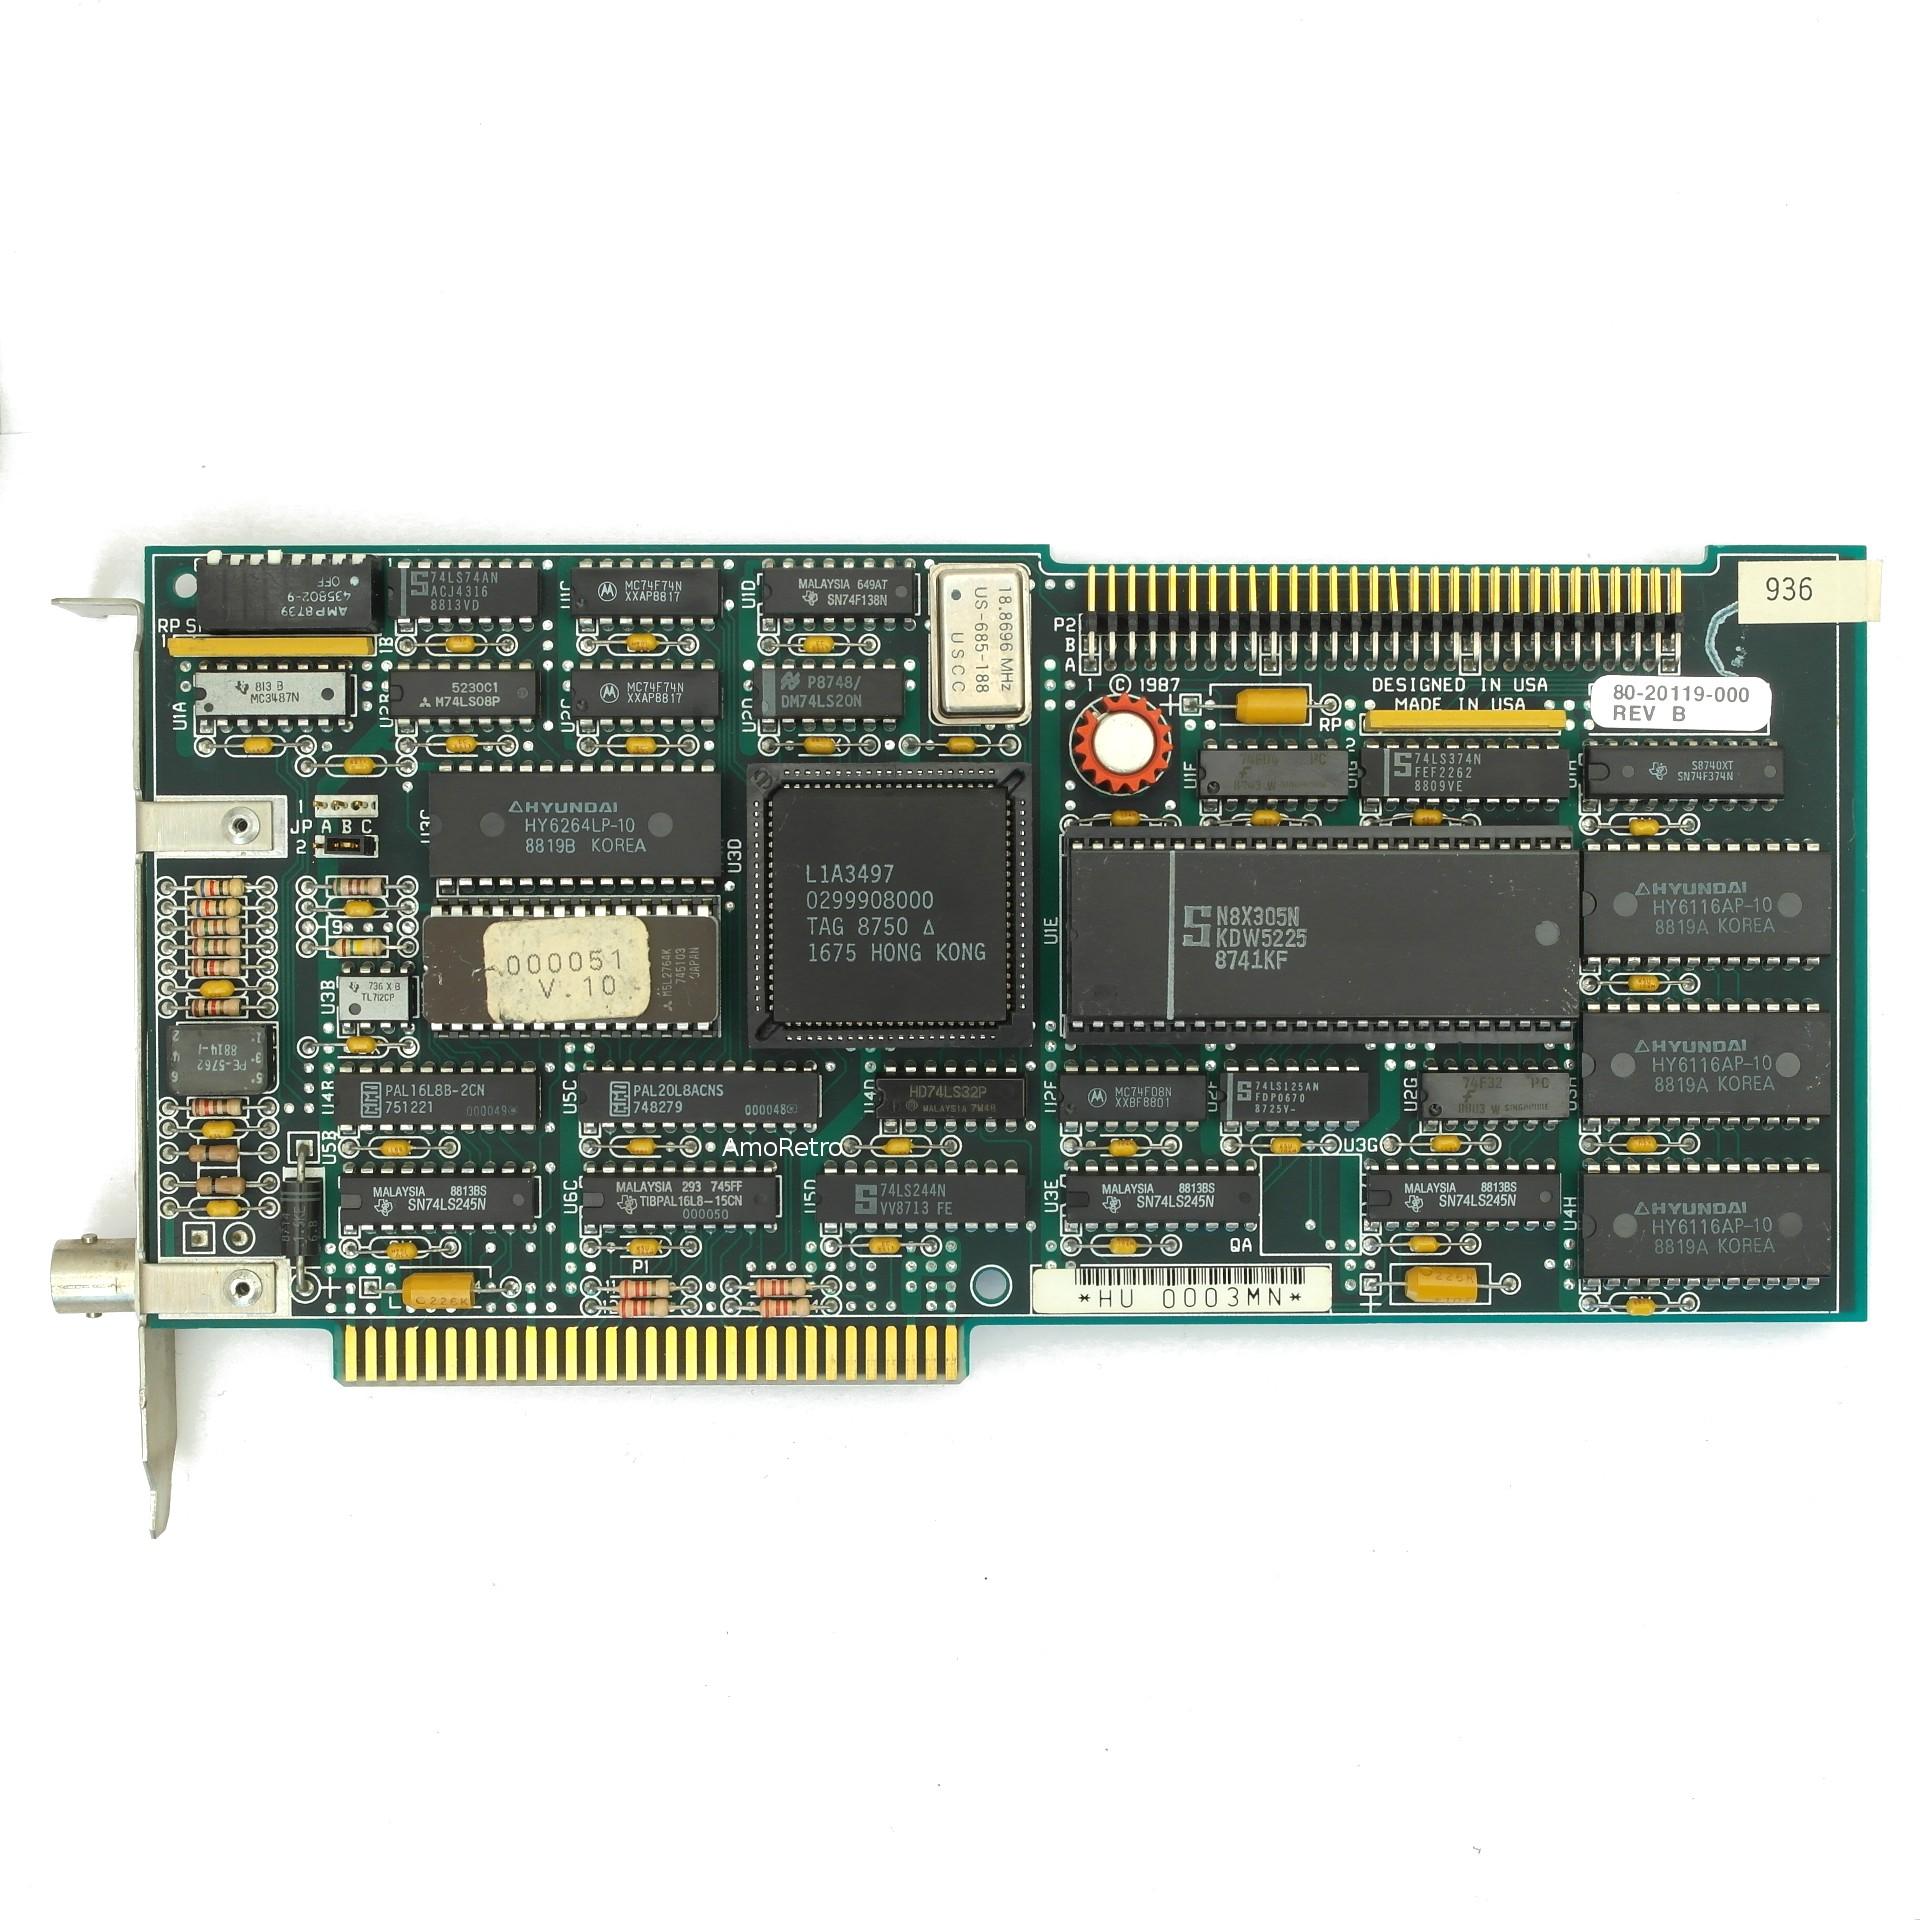 3270 ibm telnet emulator